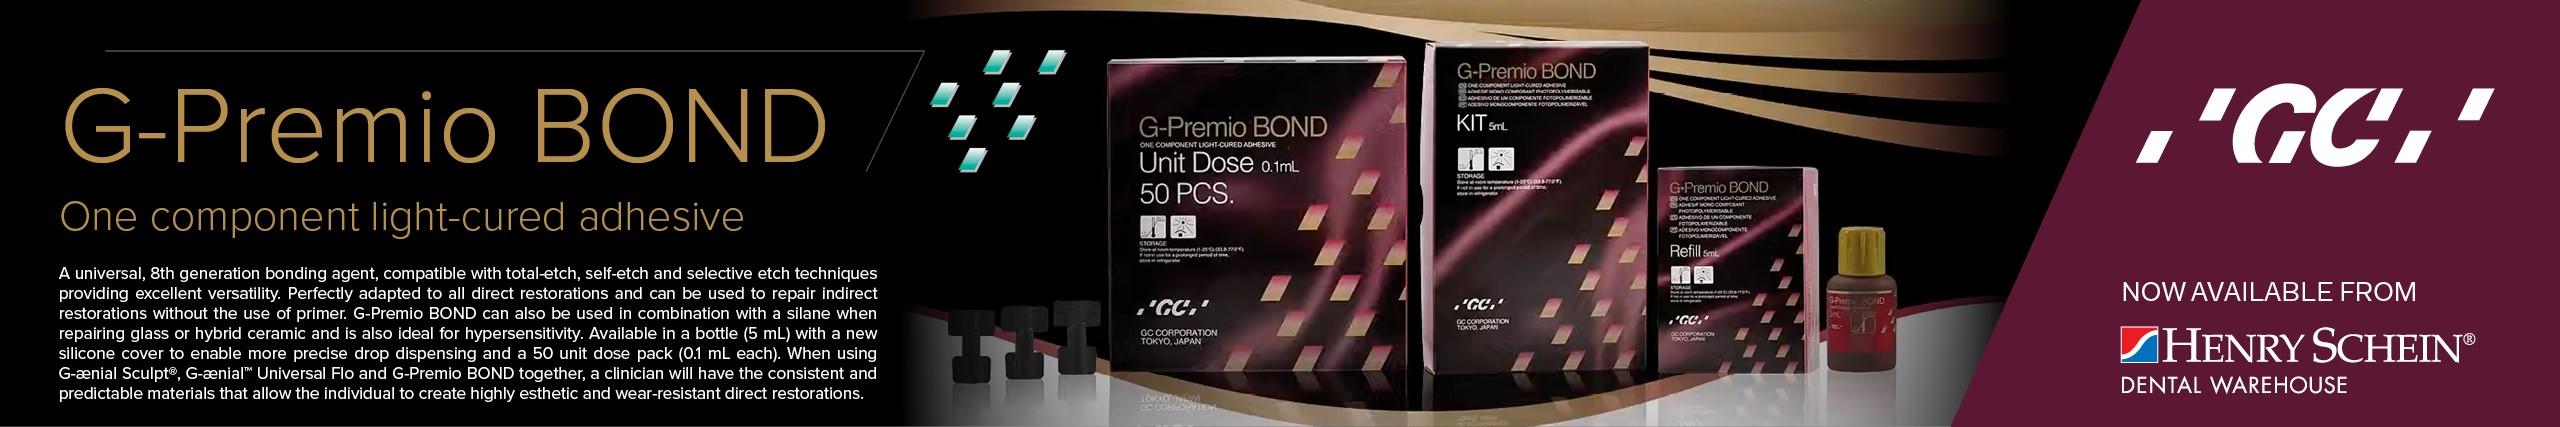 G-Premio Bond